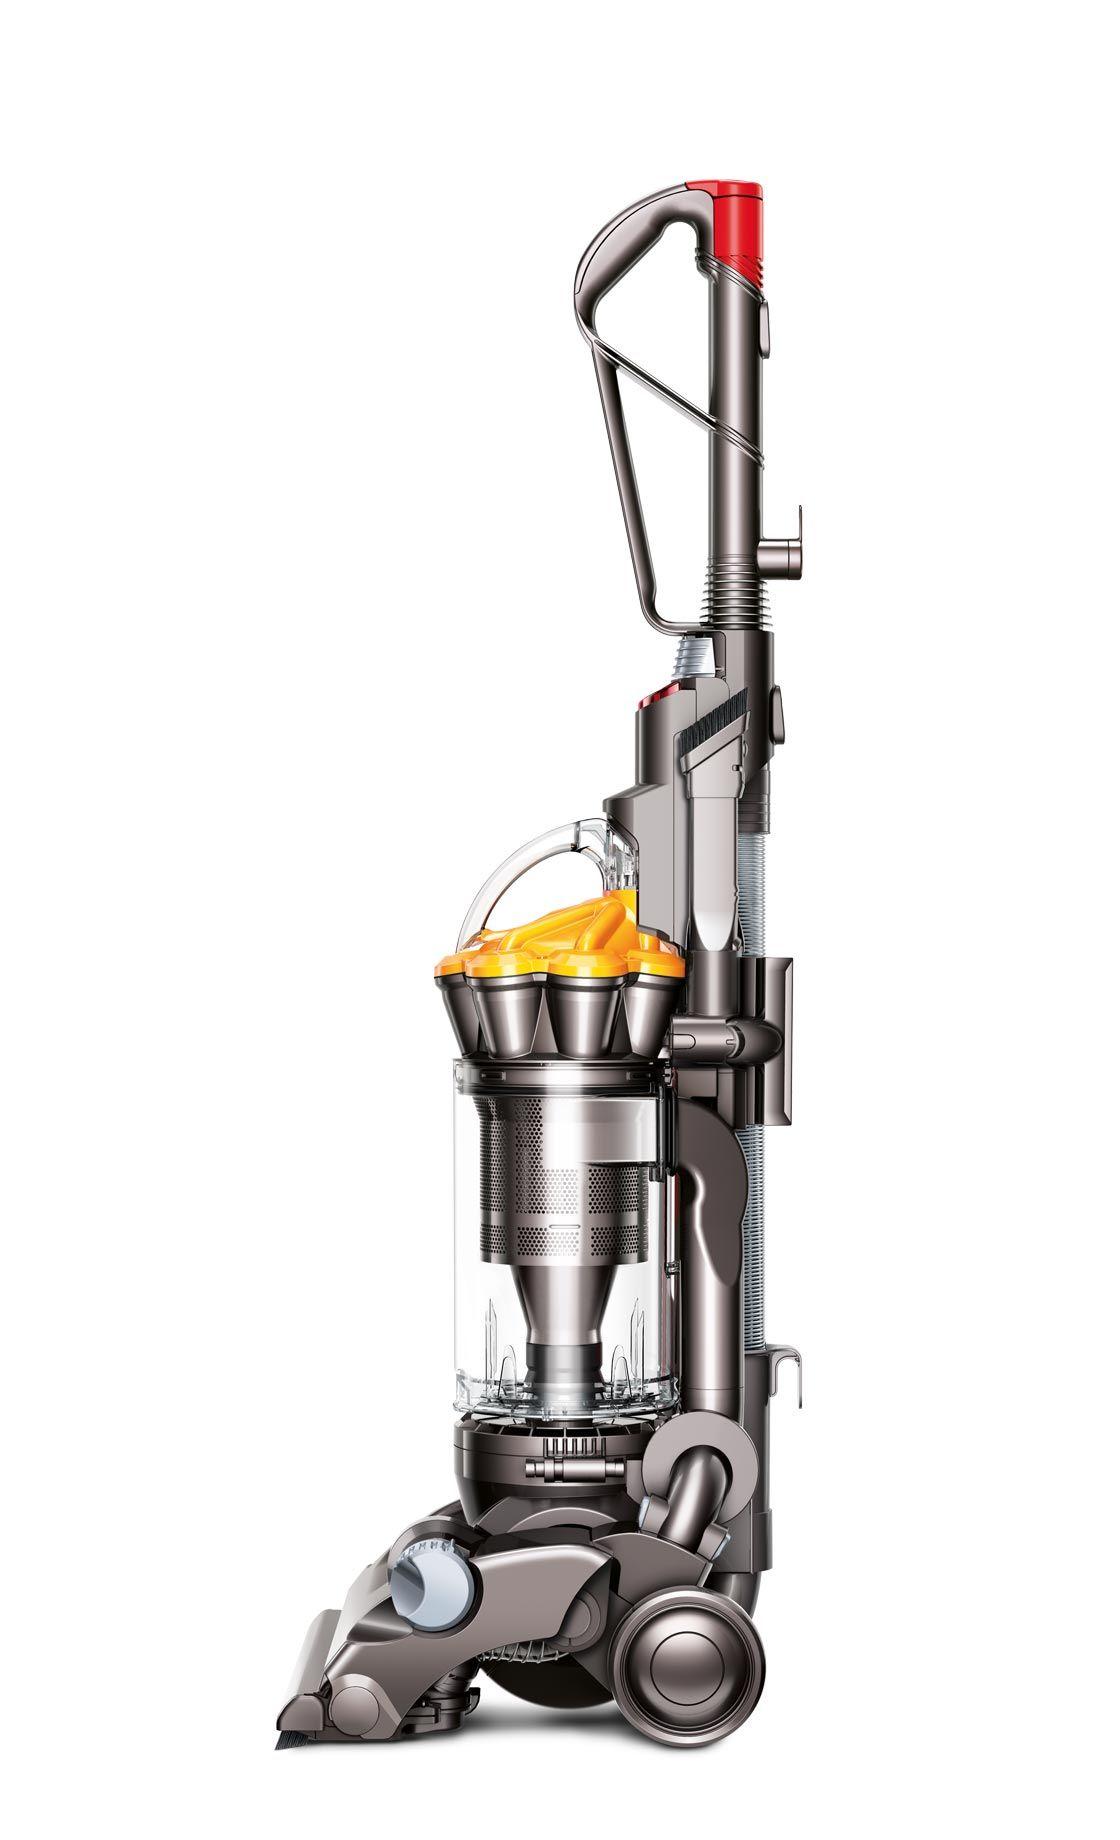 Dyson DC33 Multi Floor Vacuum Cleaner   Yellow (REFURB) $159.99 At  Newegg.com